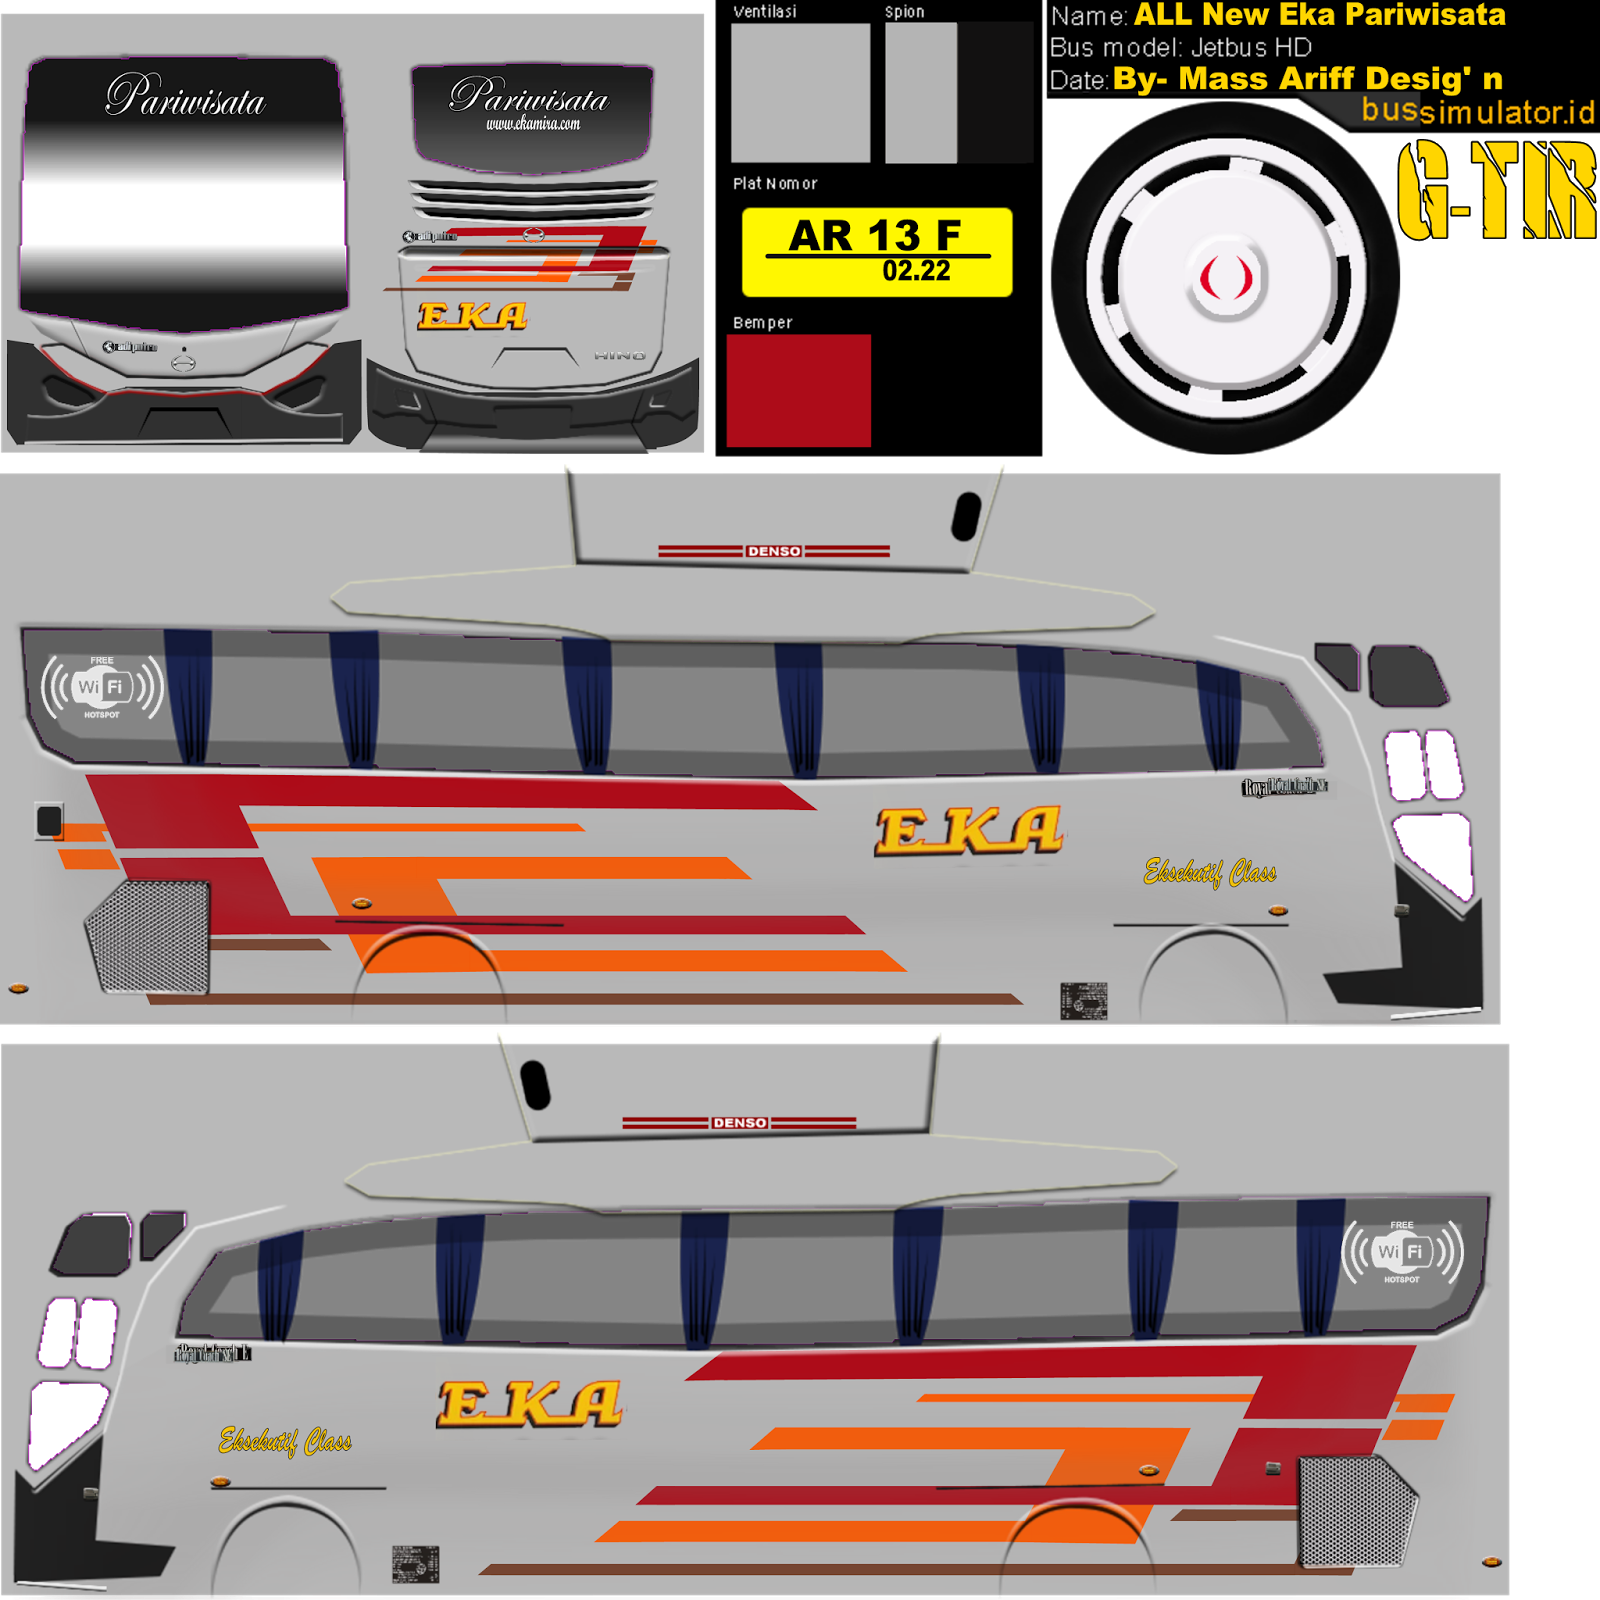 Livery Bus Shd Mira Infotiket Com